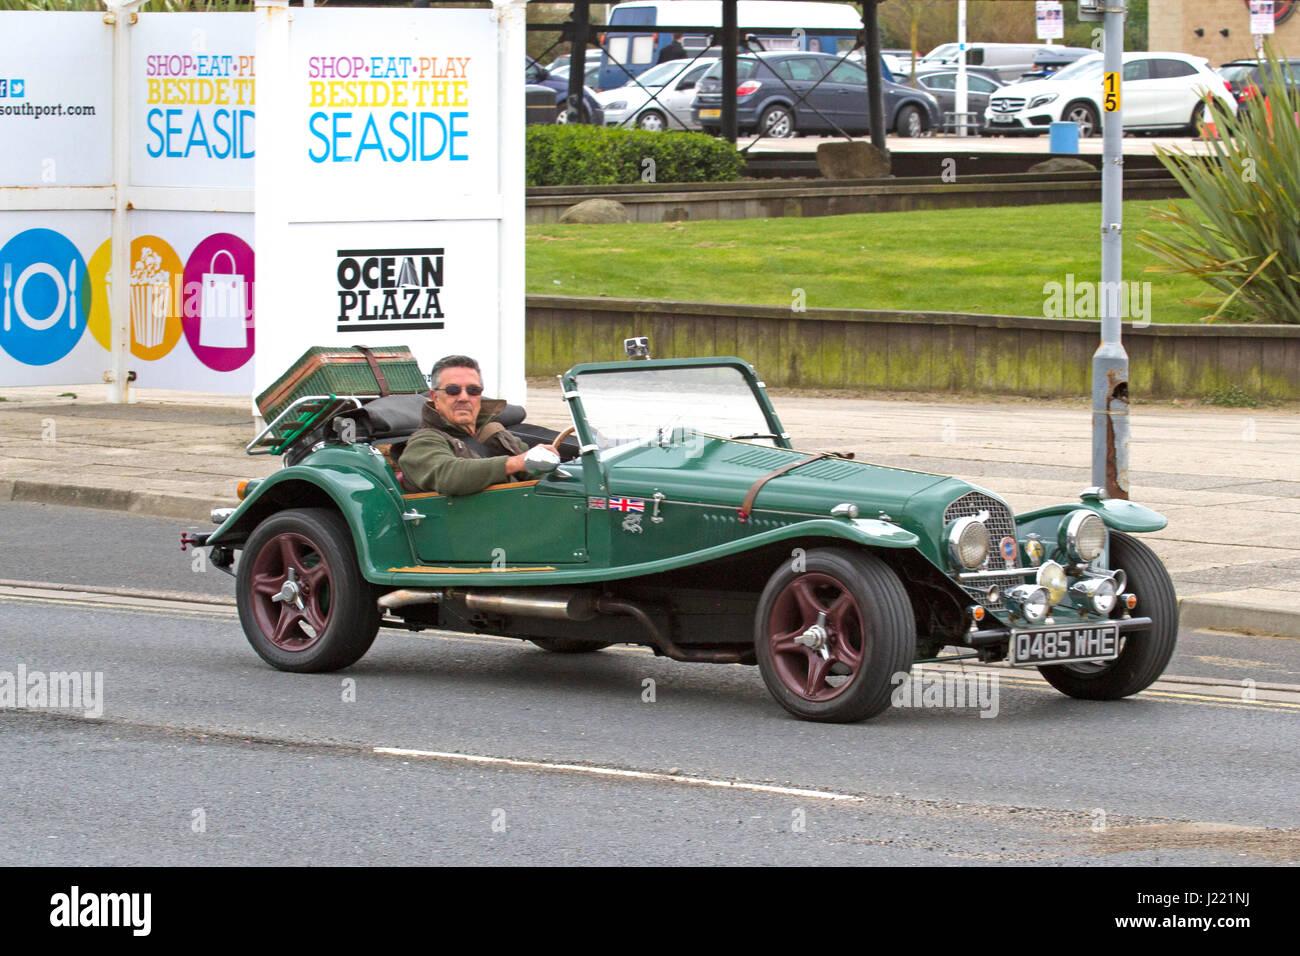 Speeding Vintage Car Stock Photos & Speeding Vintage Car Stock ...